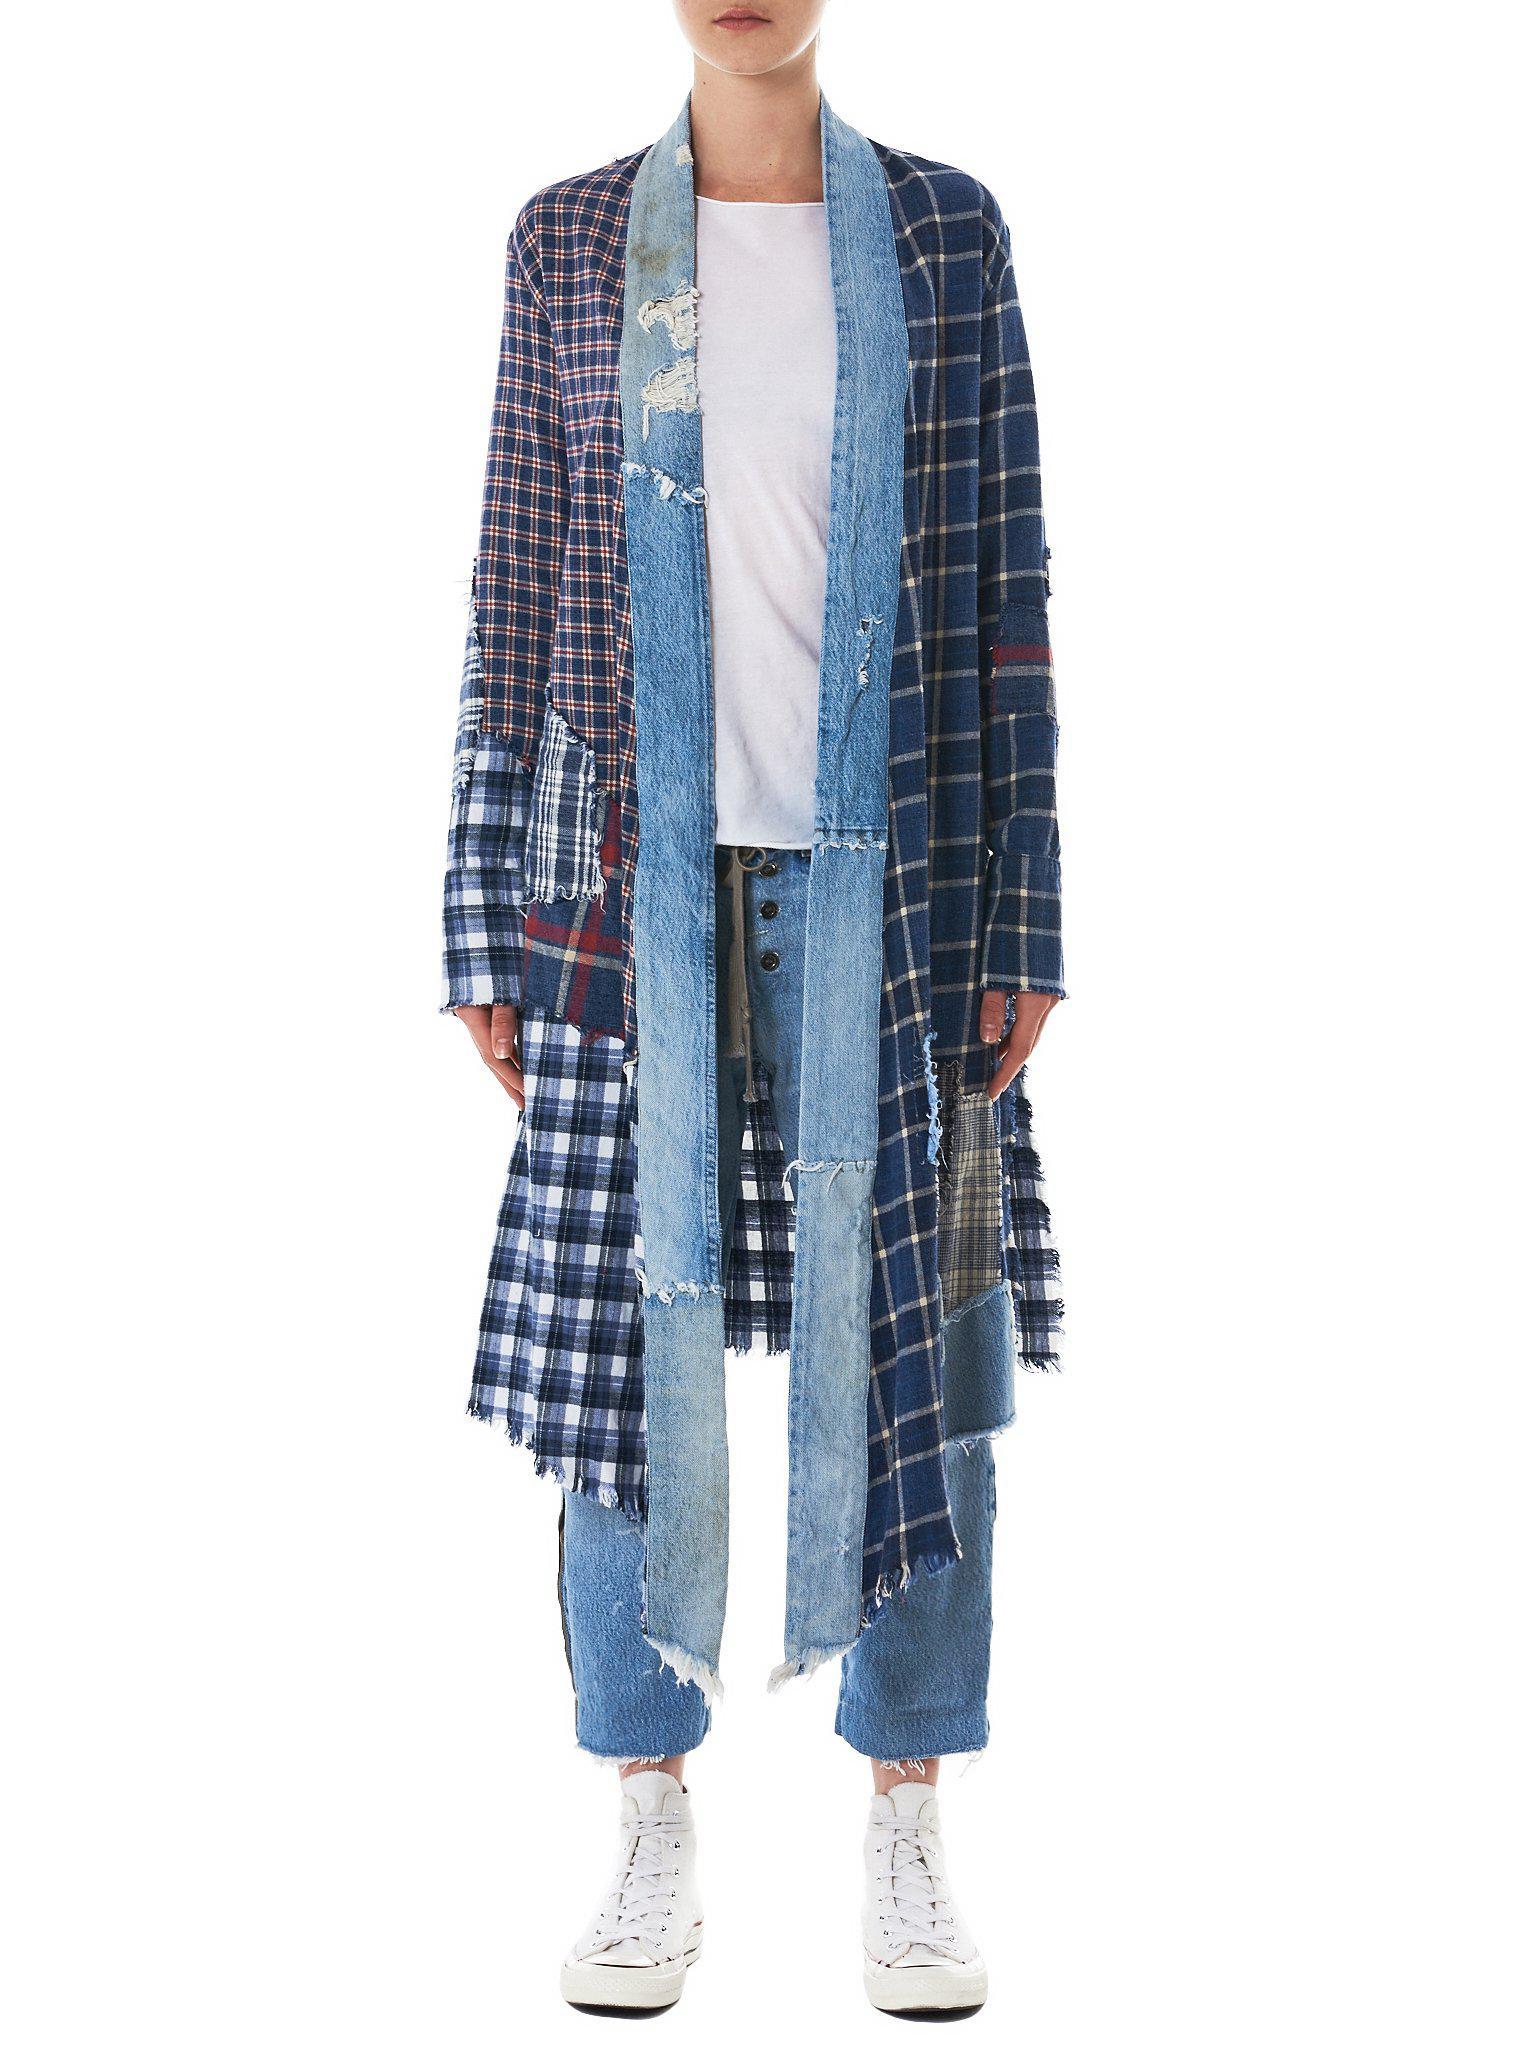 Vintage Lyst In Patchwork Greg Denim Lauren Coat X Kimono Plaid Blue zVUMqpS